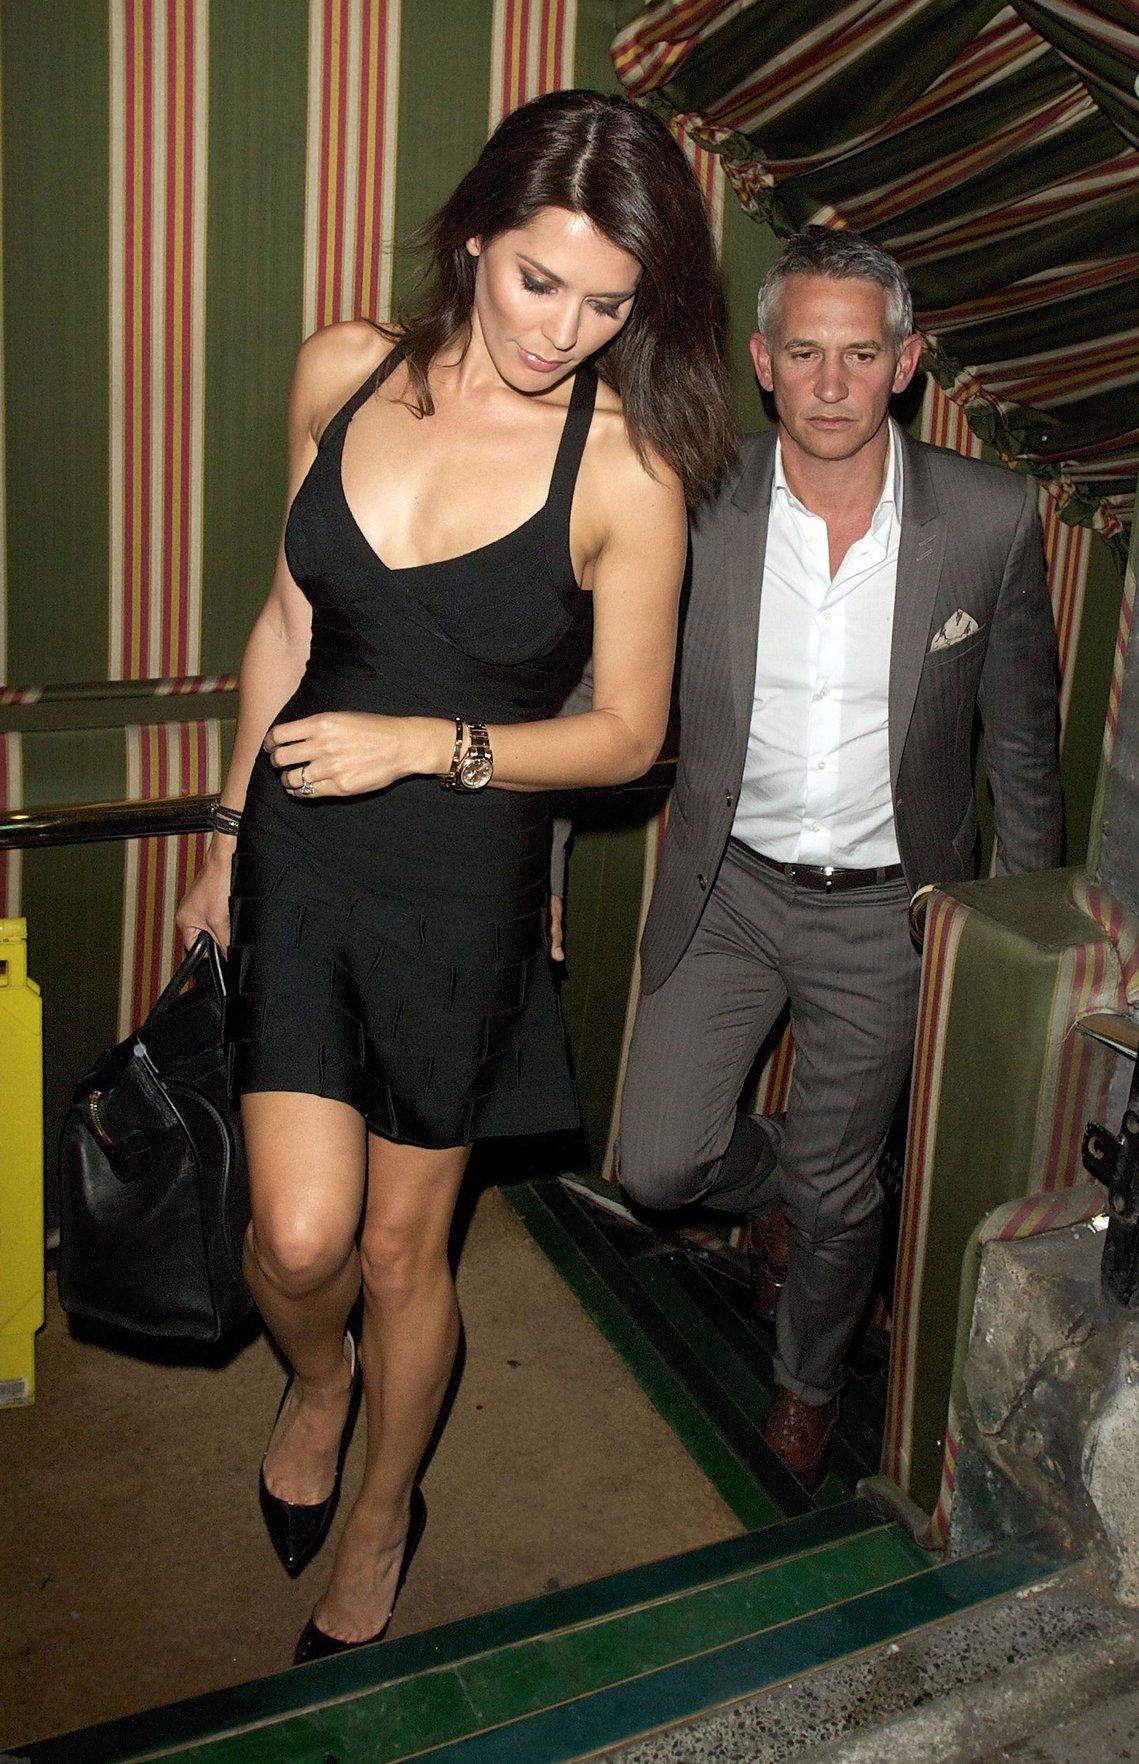 Danielle Lineker leaving Annabel's private members club October 2, 2012